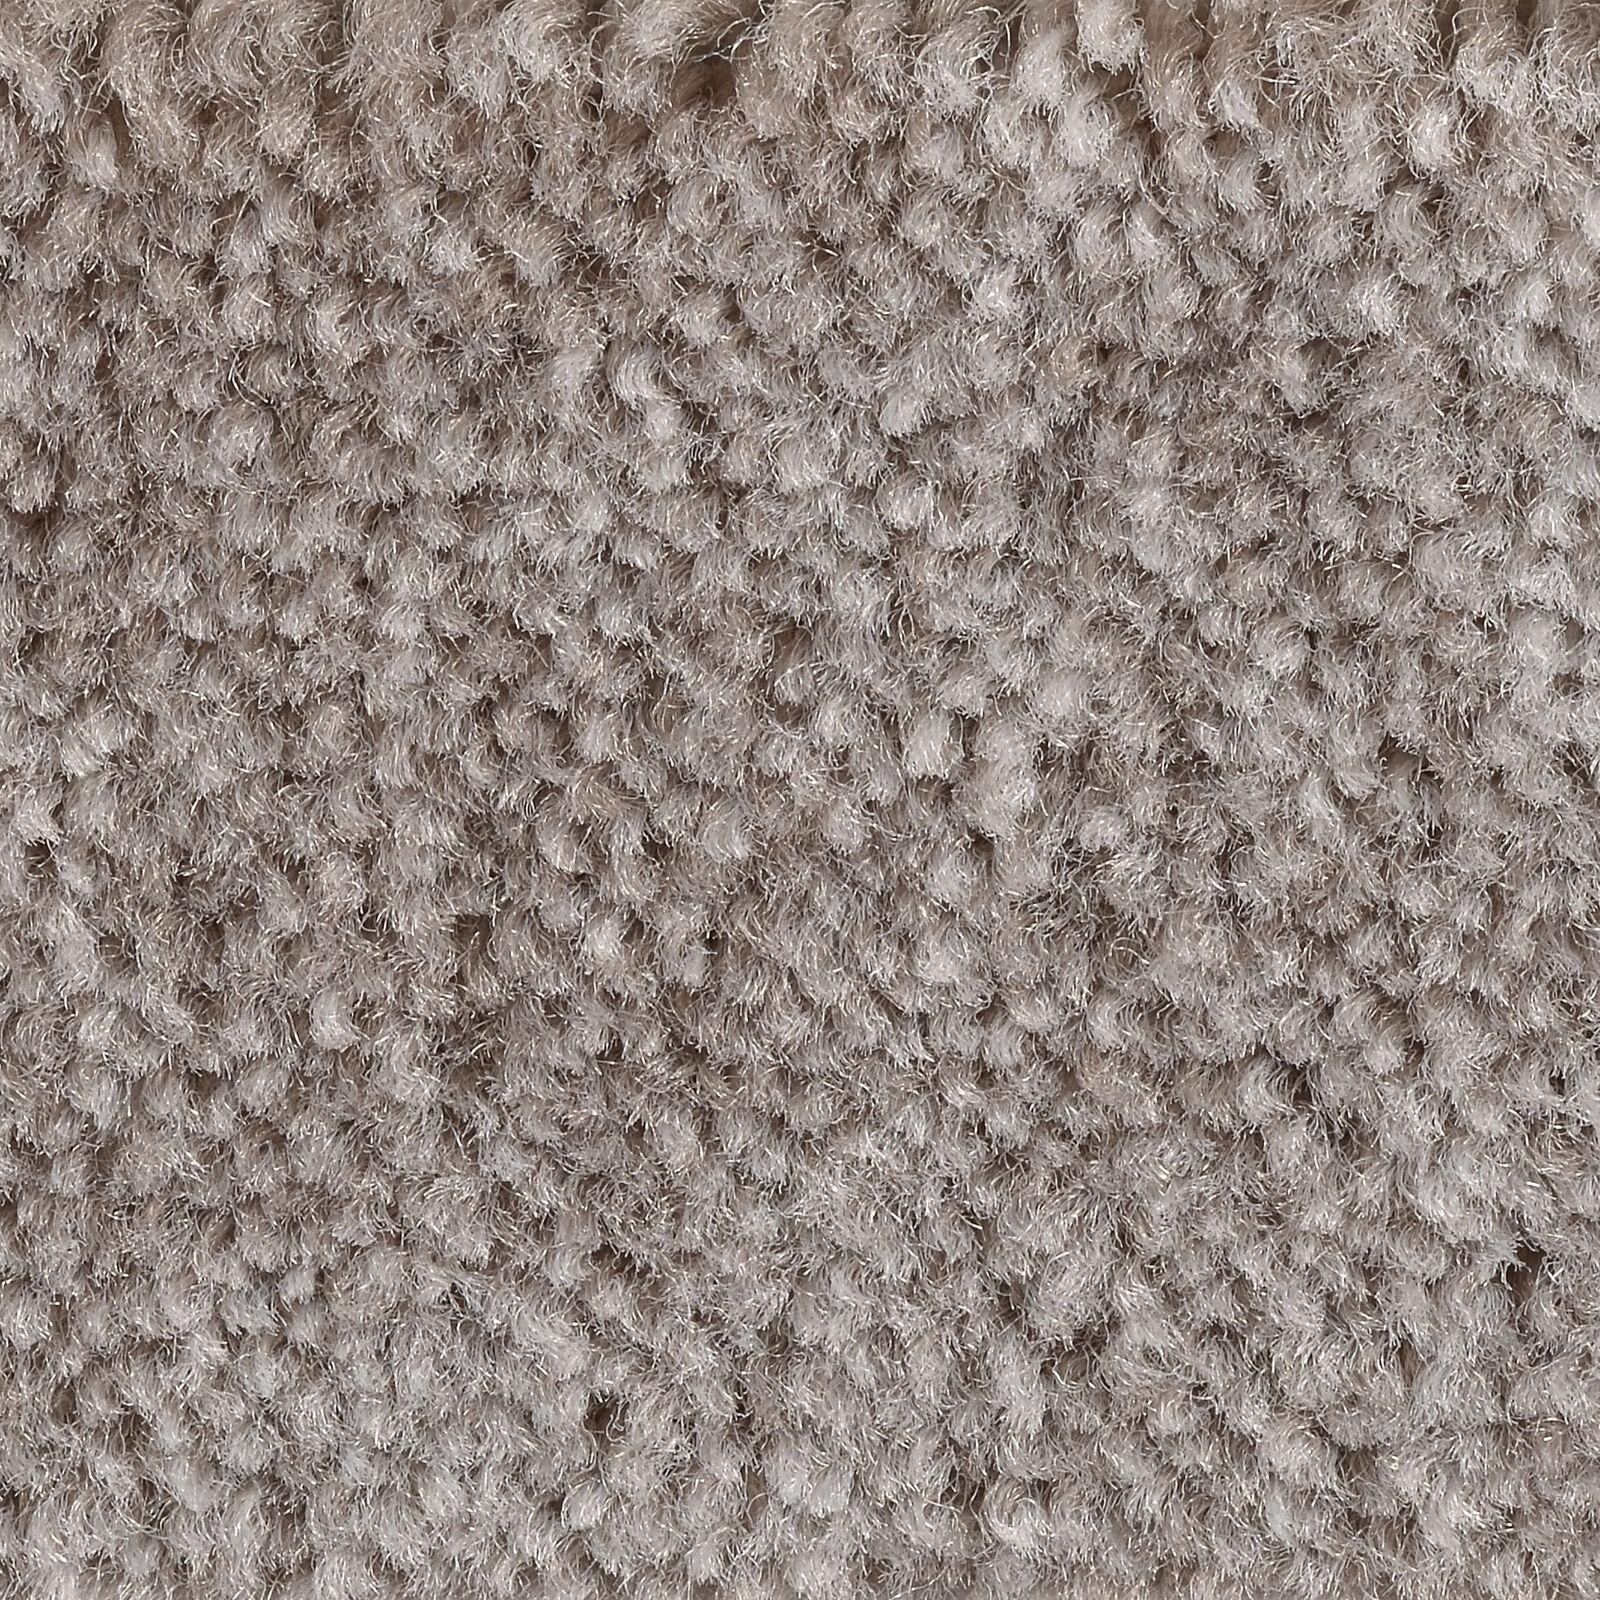 Teppichboden Meterware    Velours gemustert  4m 5m breit  grau braun    qm a34693